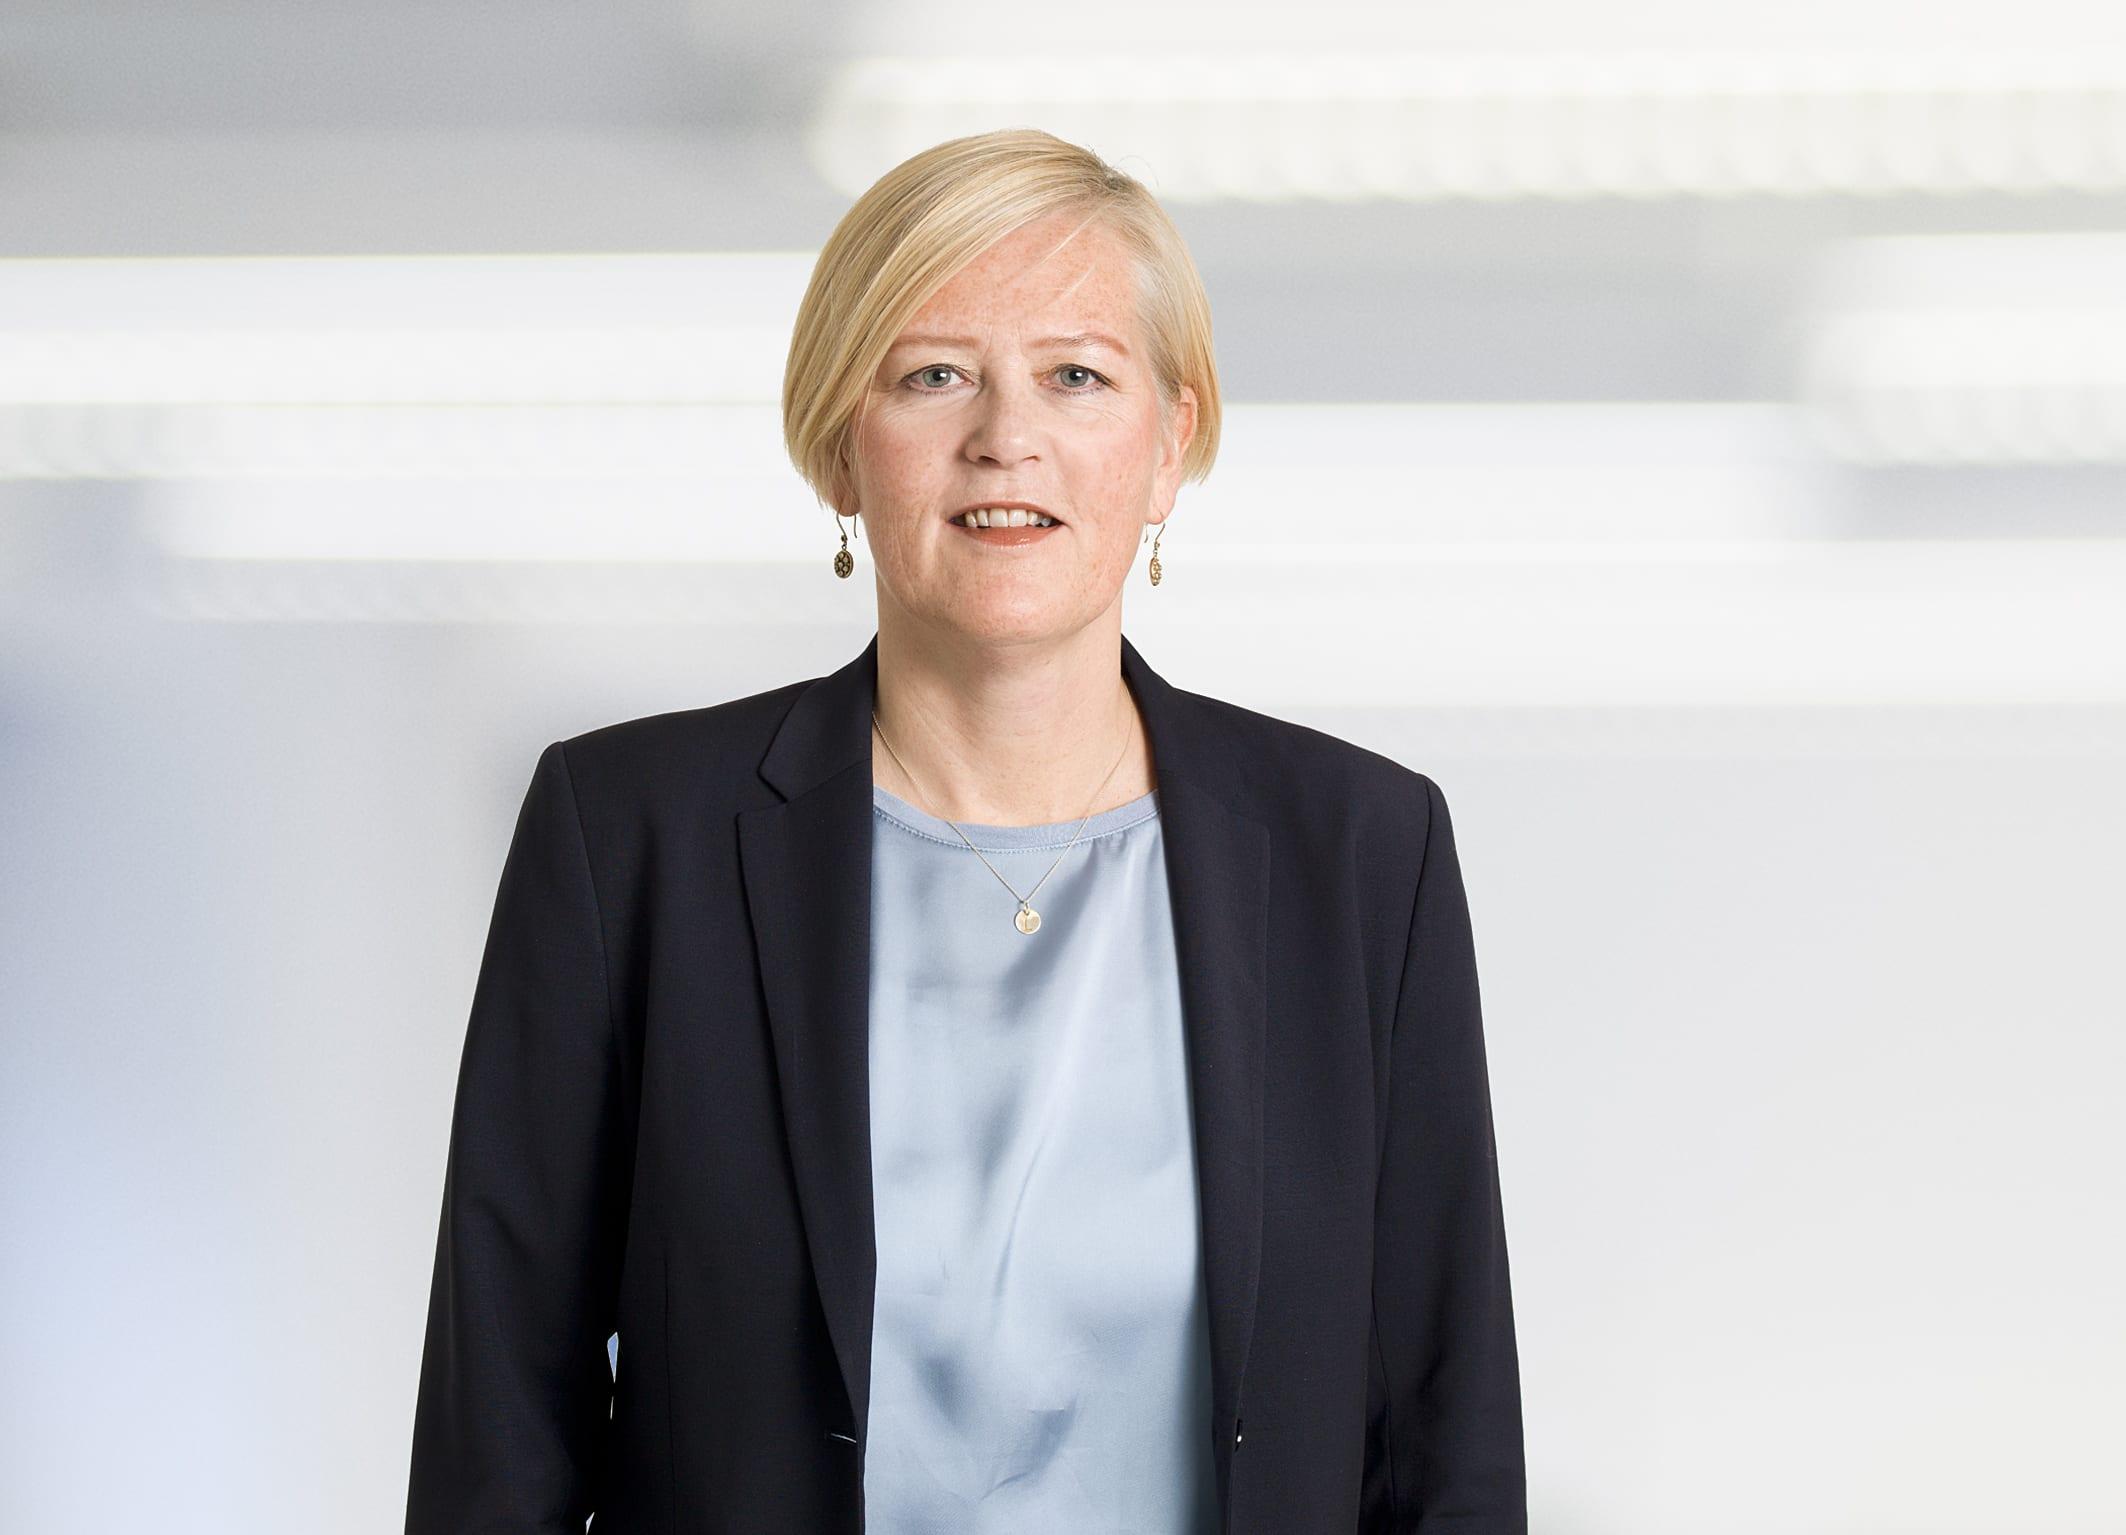 Laila Johnsen